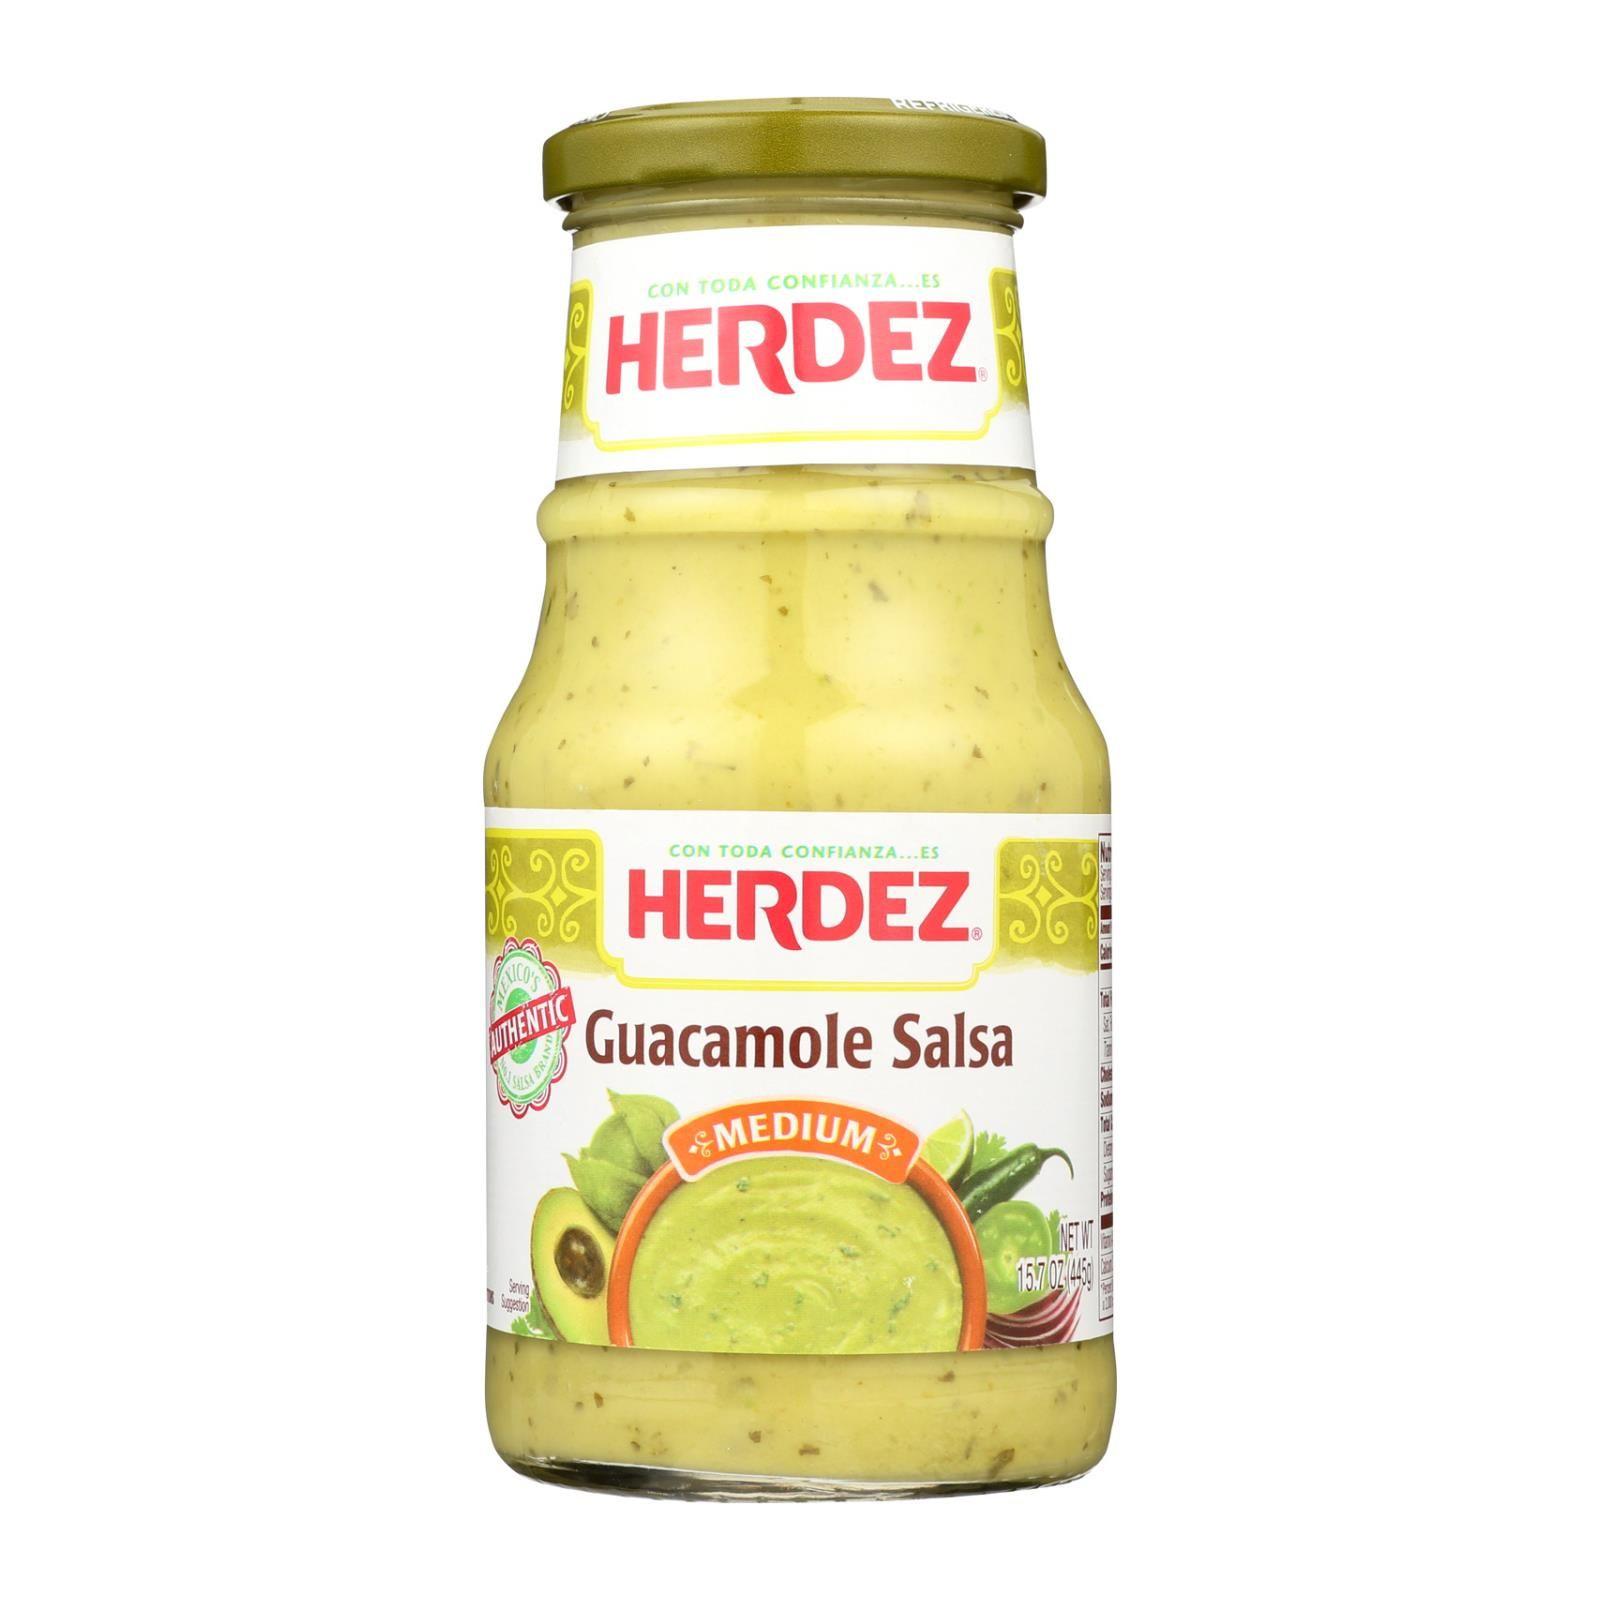 Herdez salsa guacamole case of 12 157 oz with